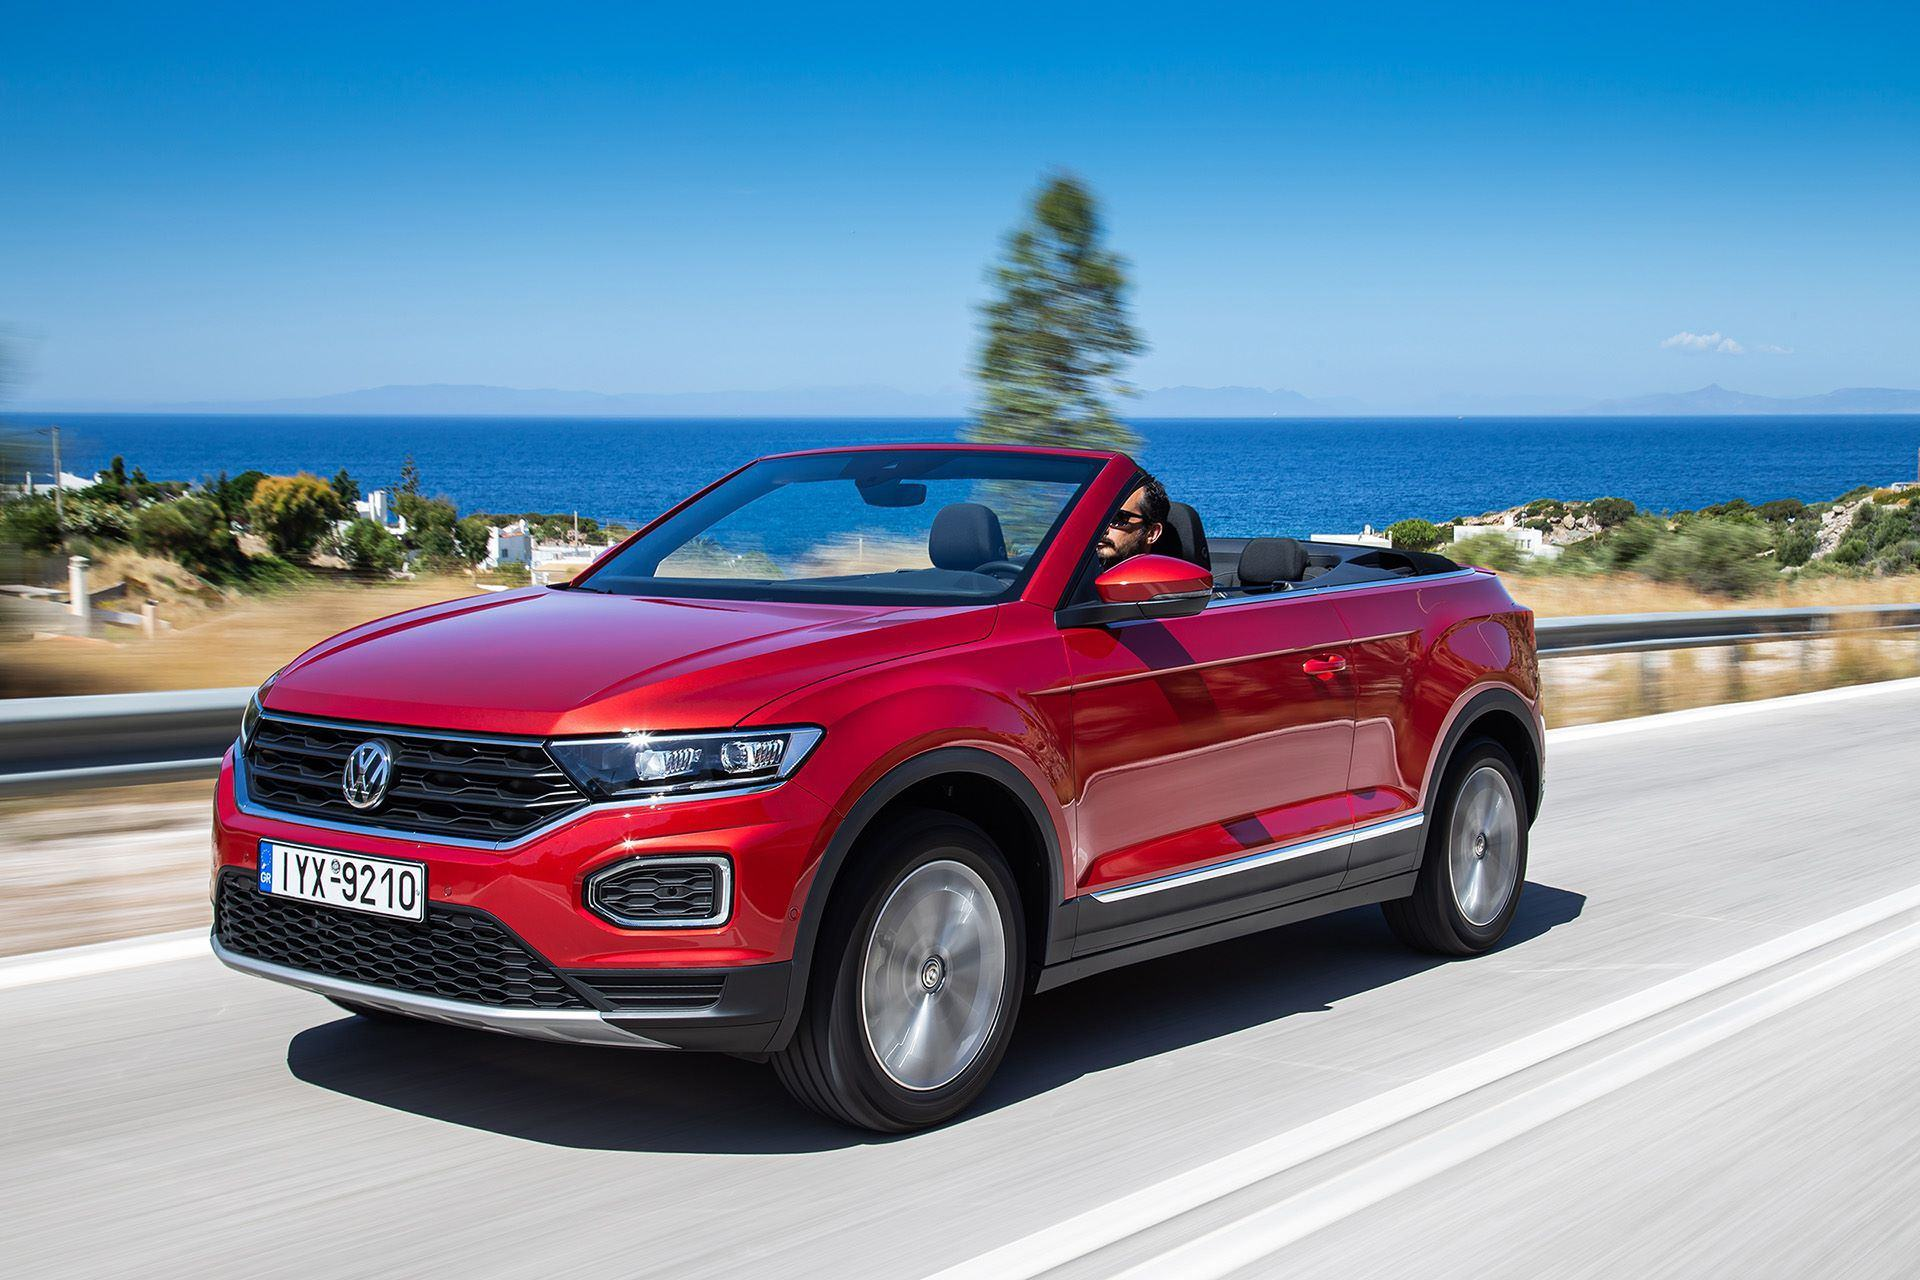 Volkswagen-T-Roc-Cabriolet-Greece-40